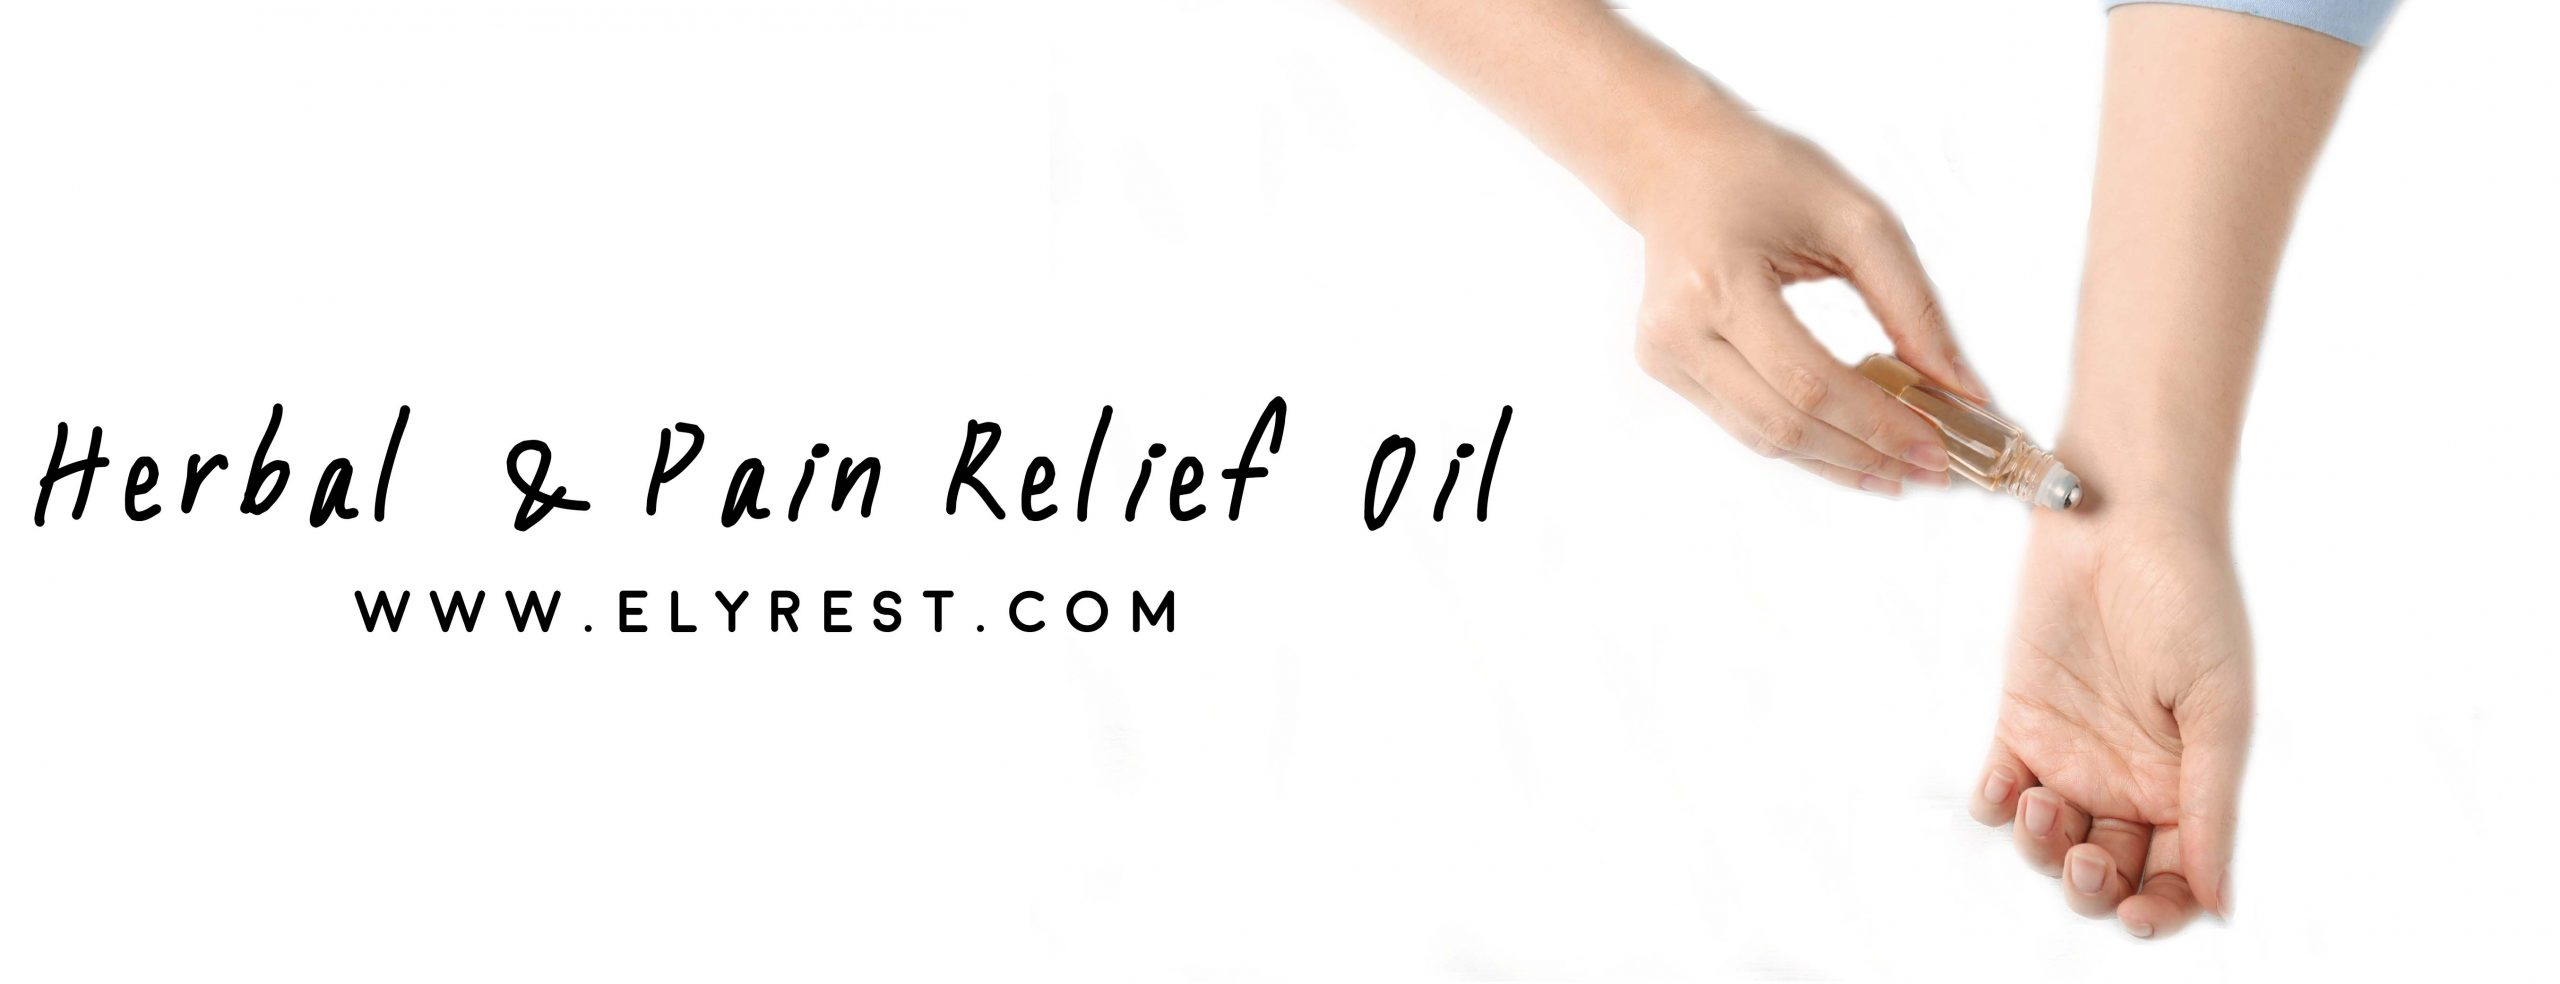 Herbal & Pain Relief Oil